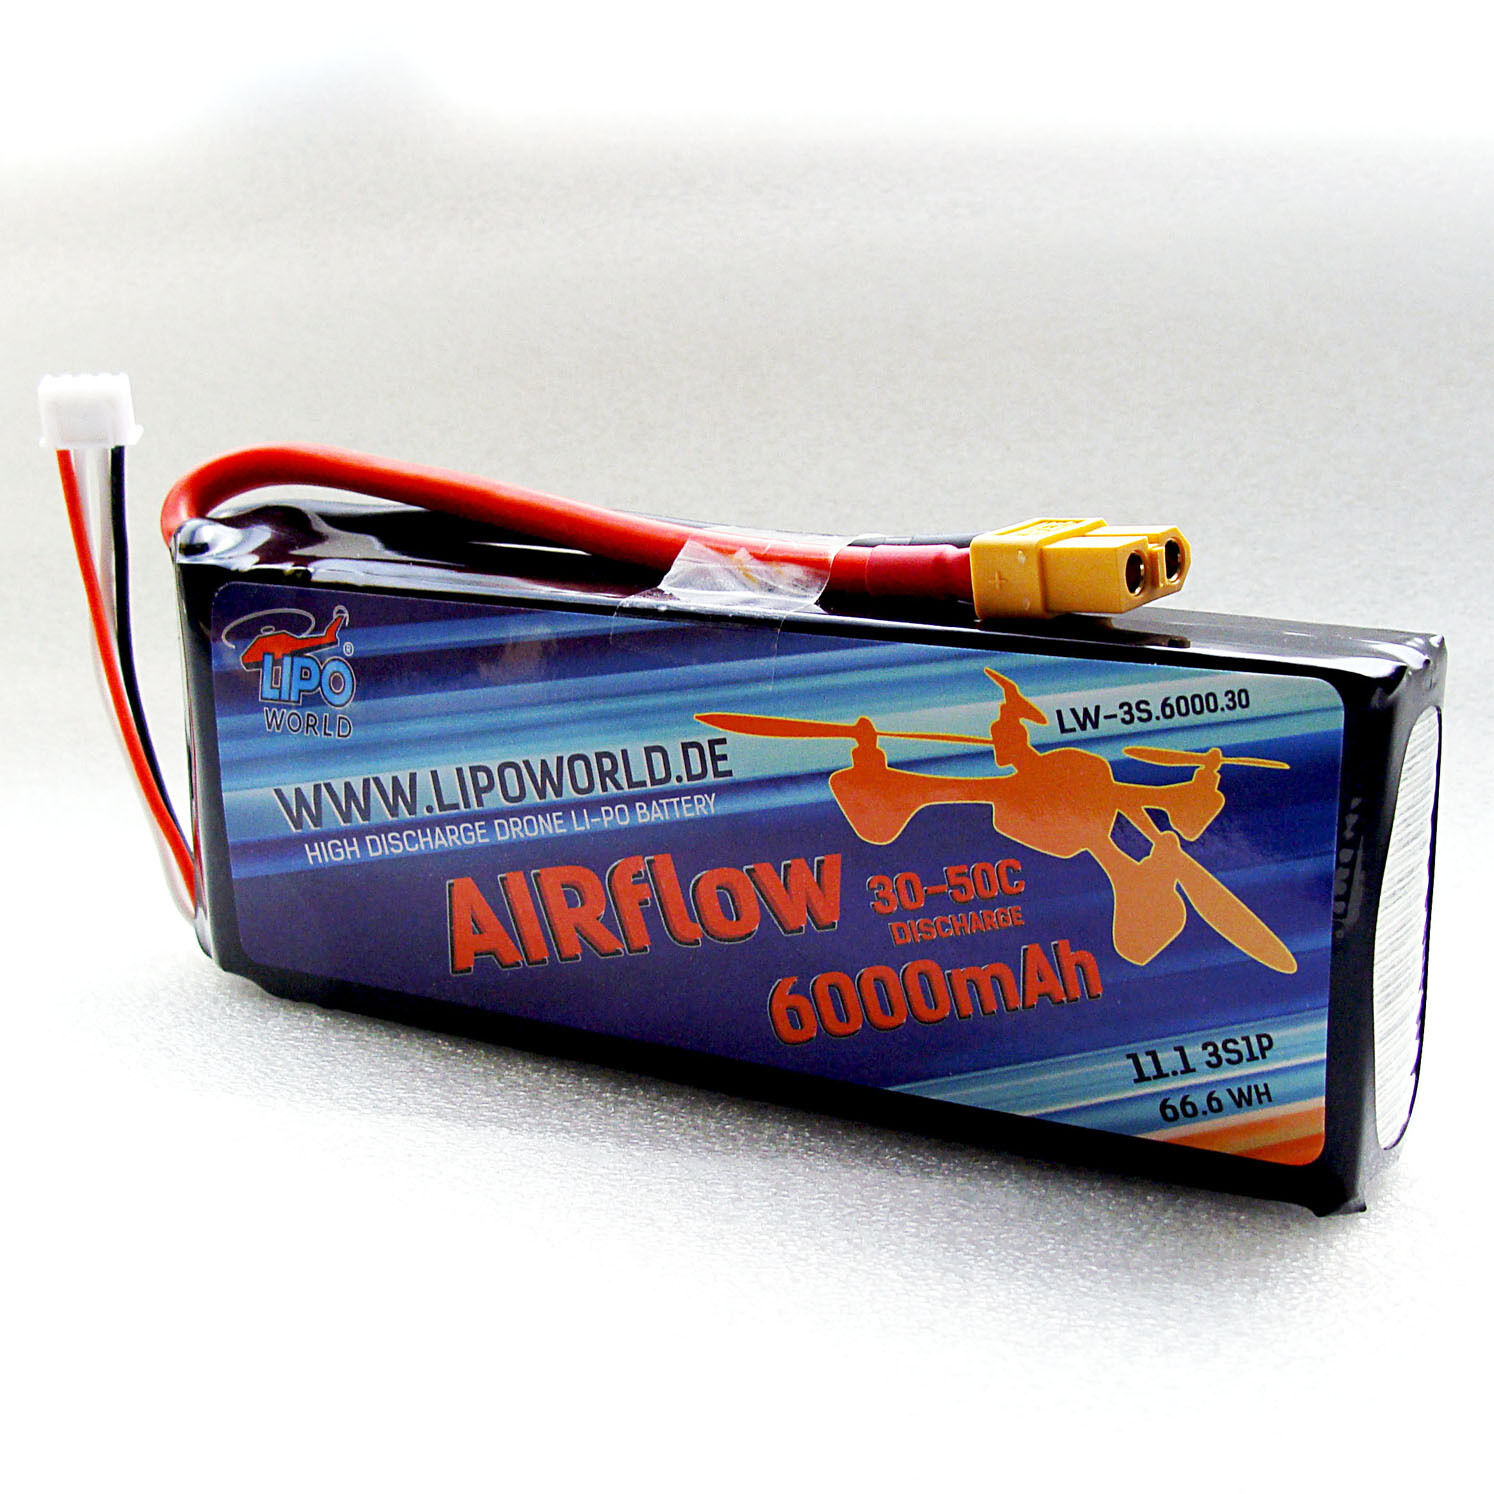 Lipo World AIRflow Lipo Akku 3S 11,1V 6000mAh 30C-50C DJI Drohne Copter Quadro